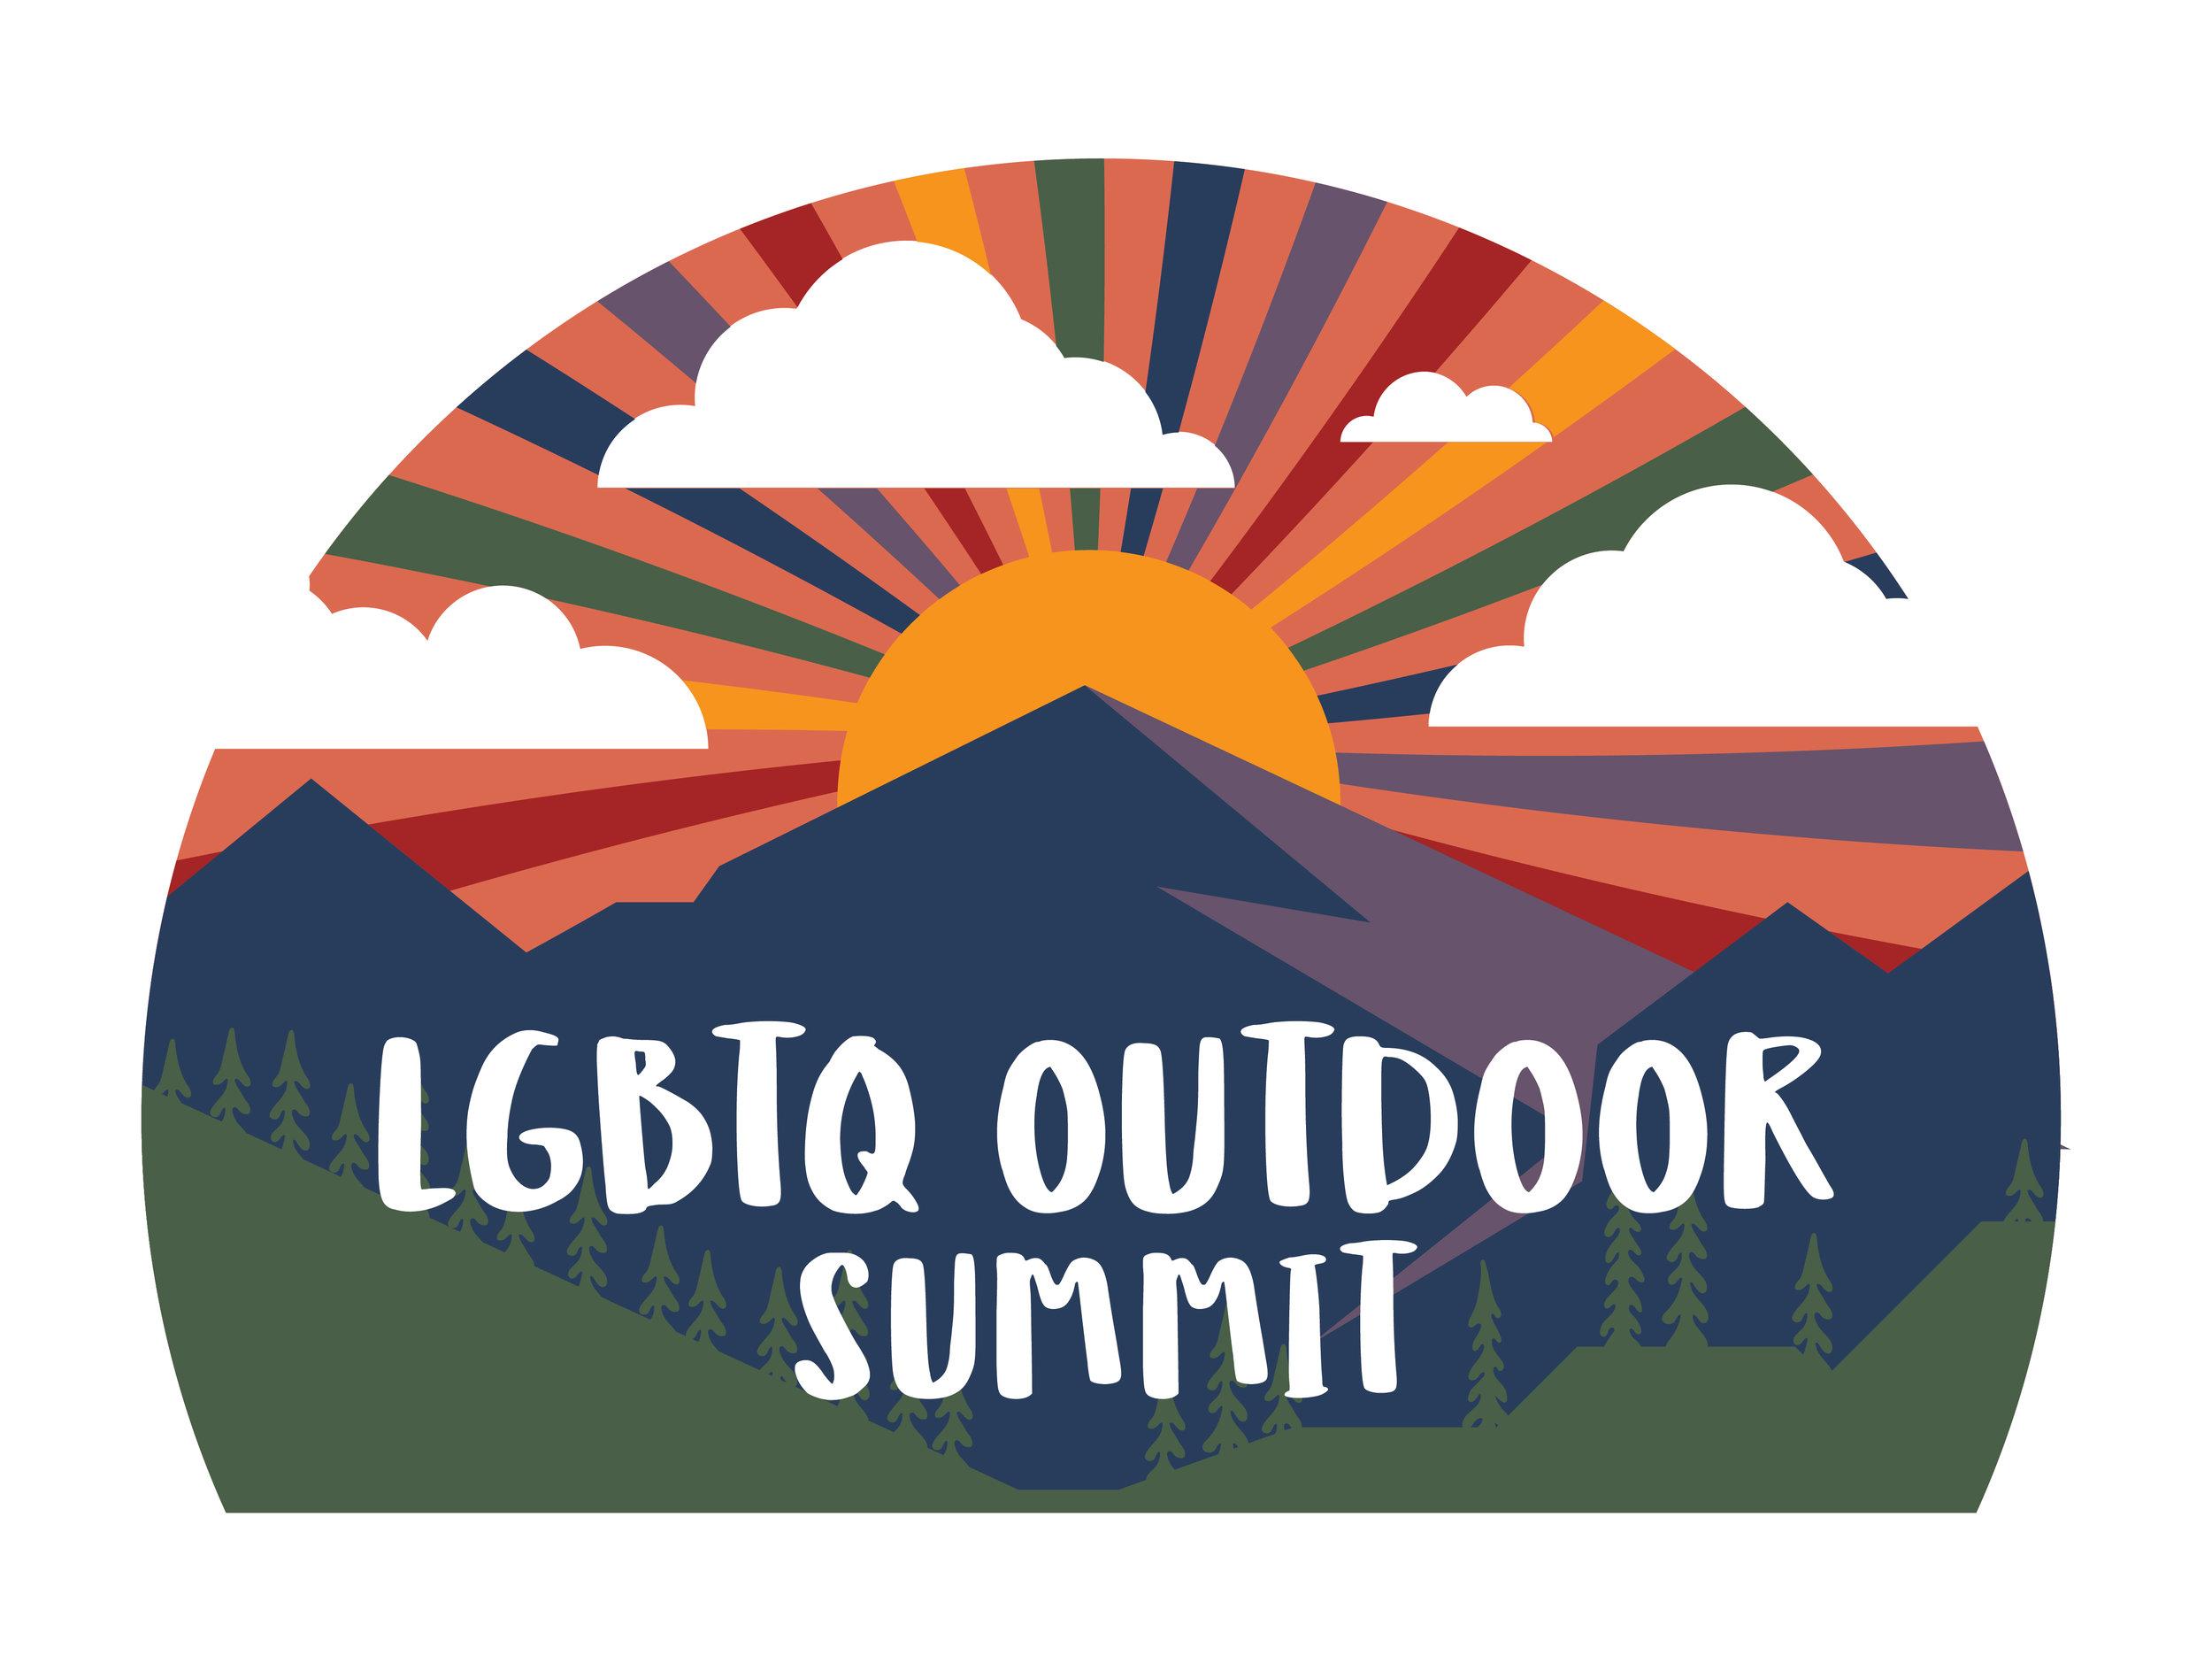 LGBTQ Summit_v2-01.jpg